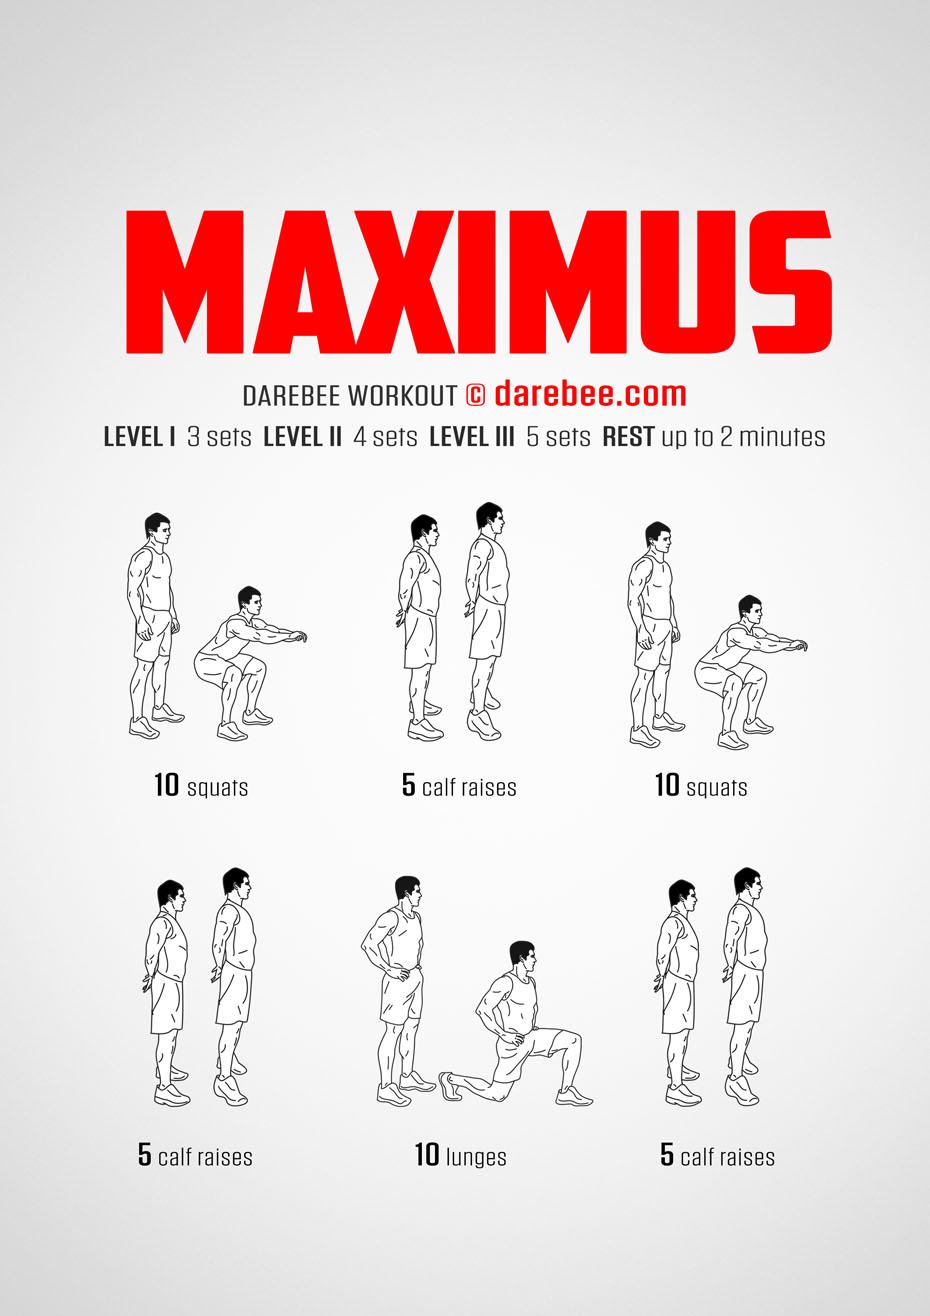 Maximus Workout